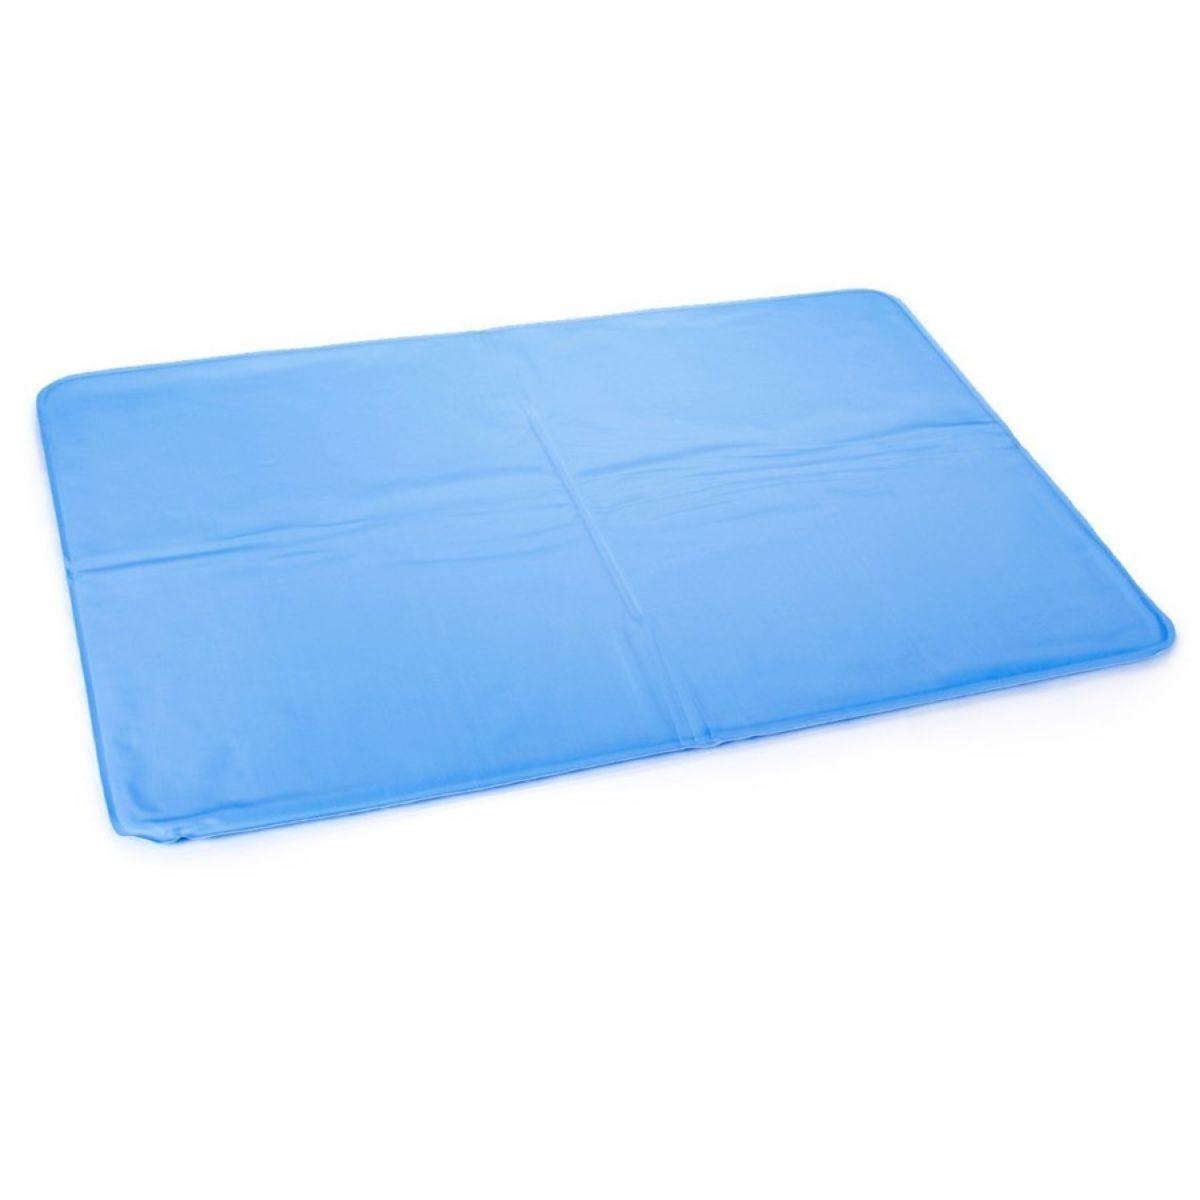 Lifemax Cool Pillow Pad (30x40cm)